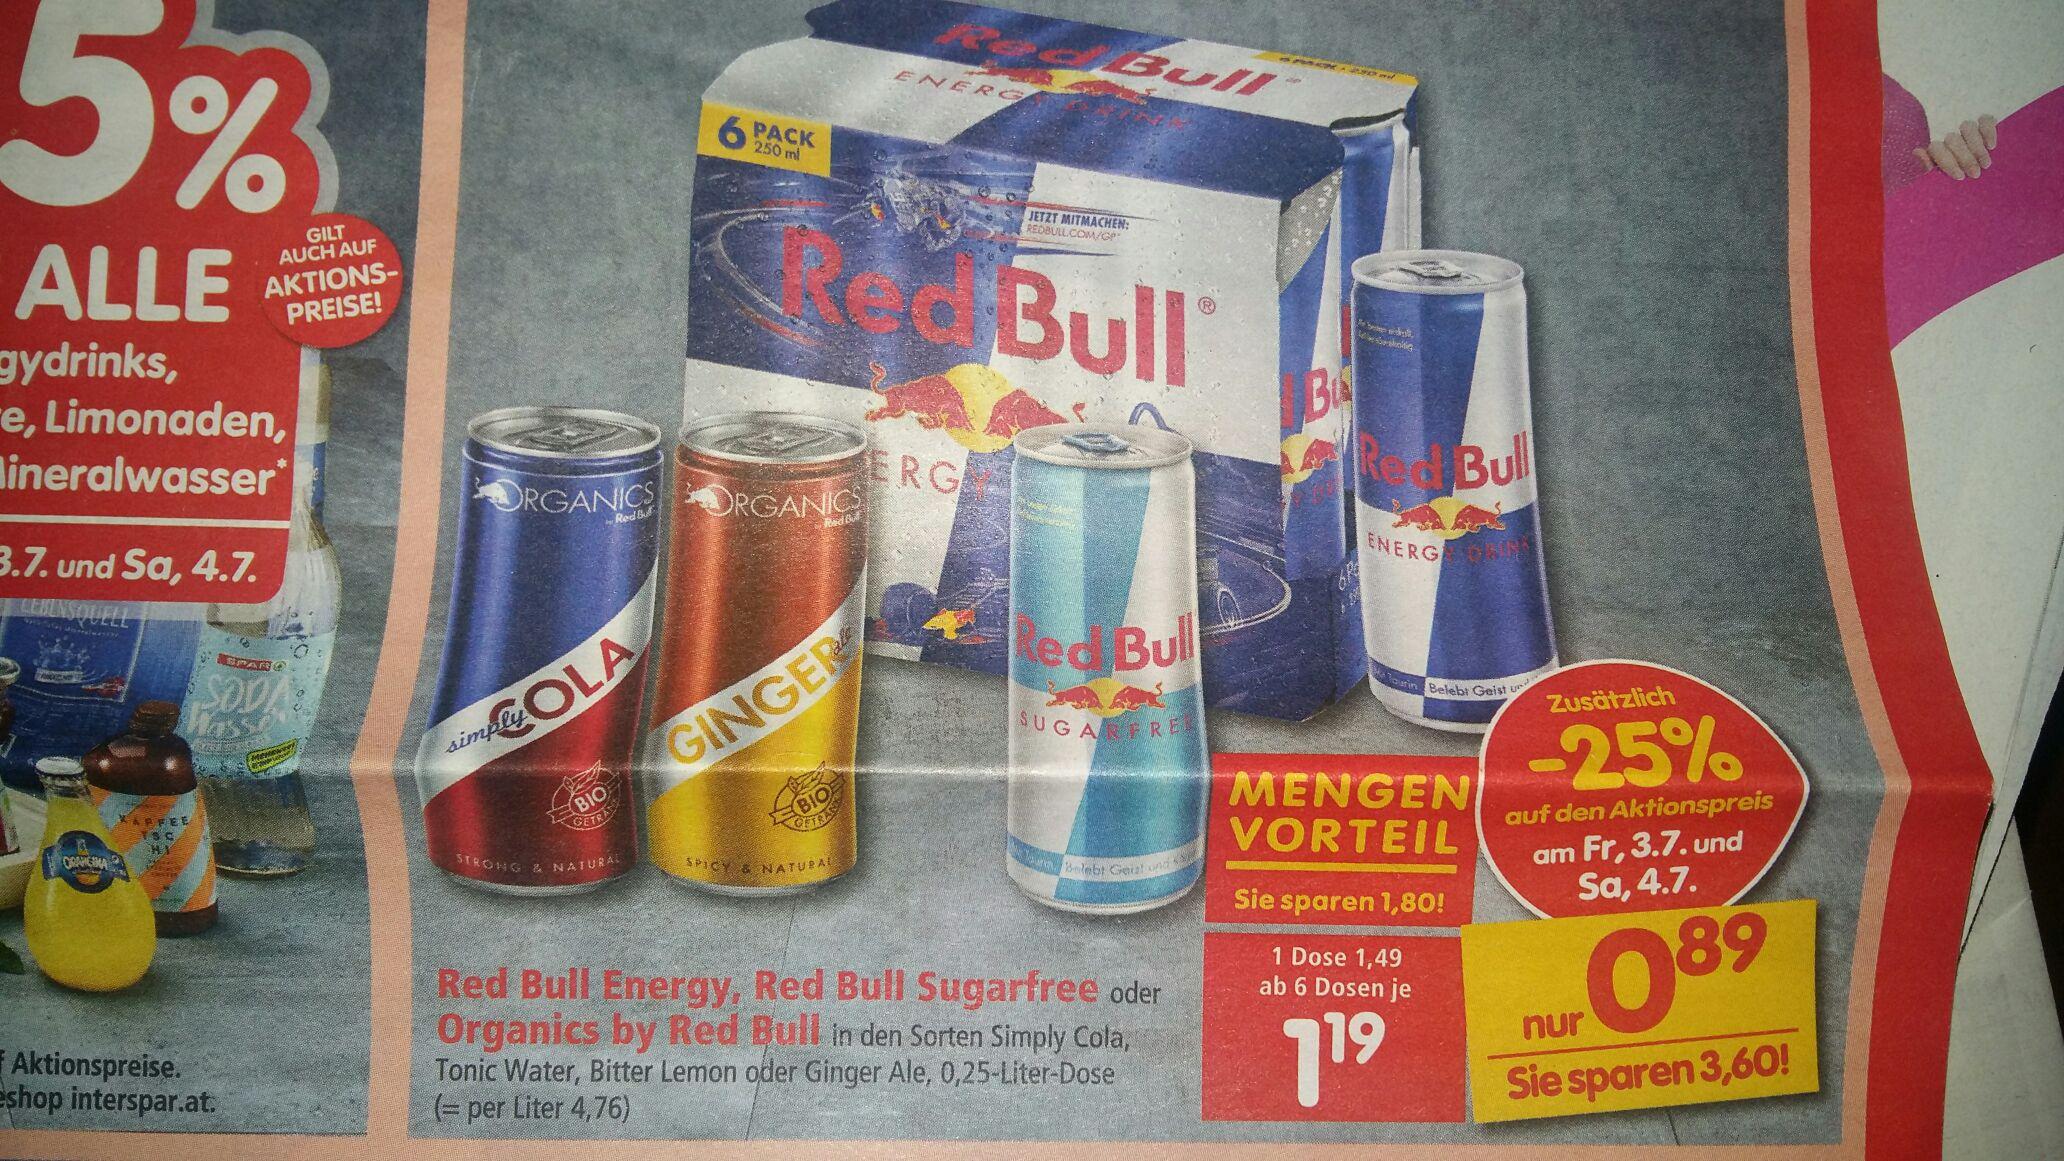 Interspar - 6 Dosen Red Bull, Sugarfree o. Organics